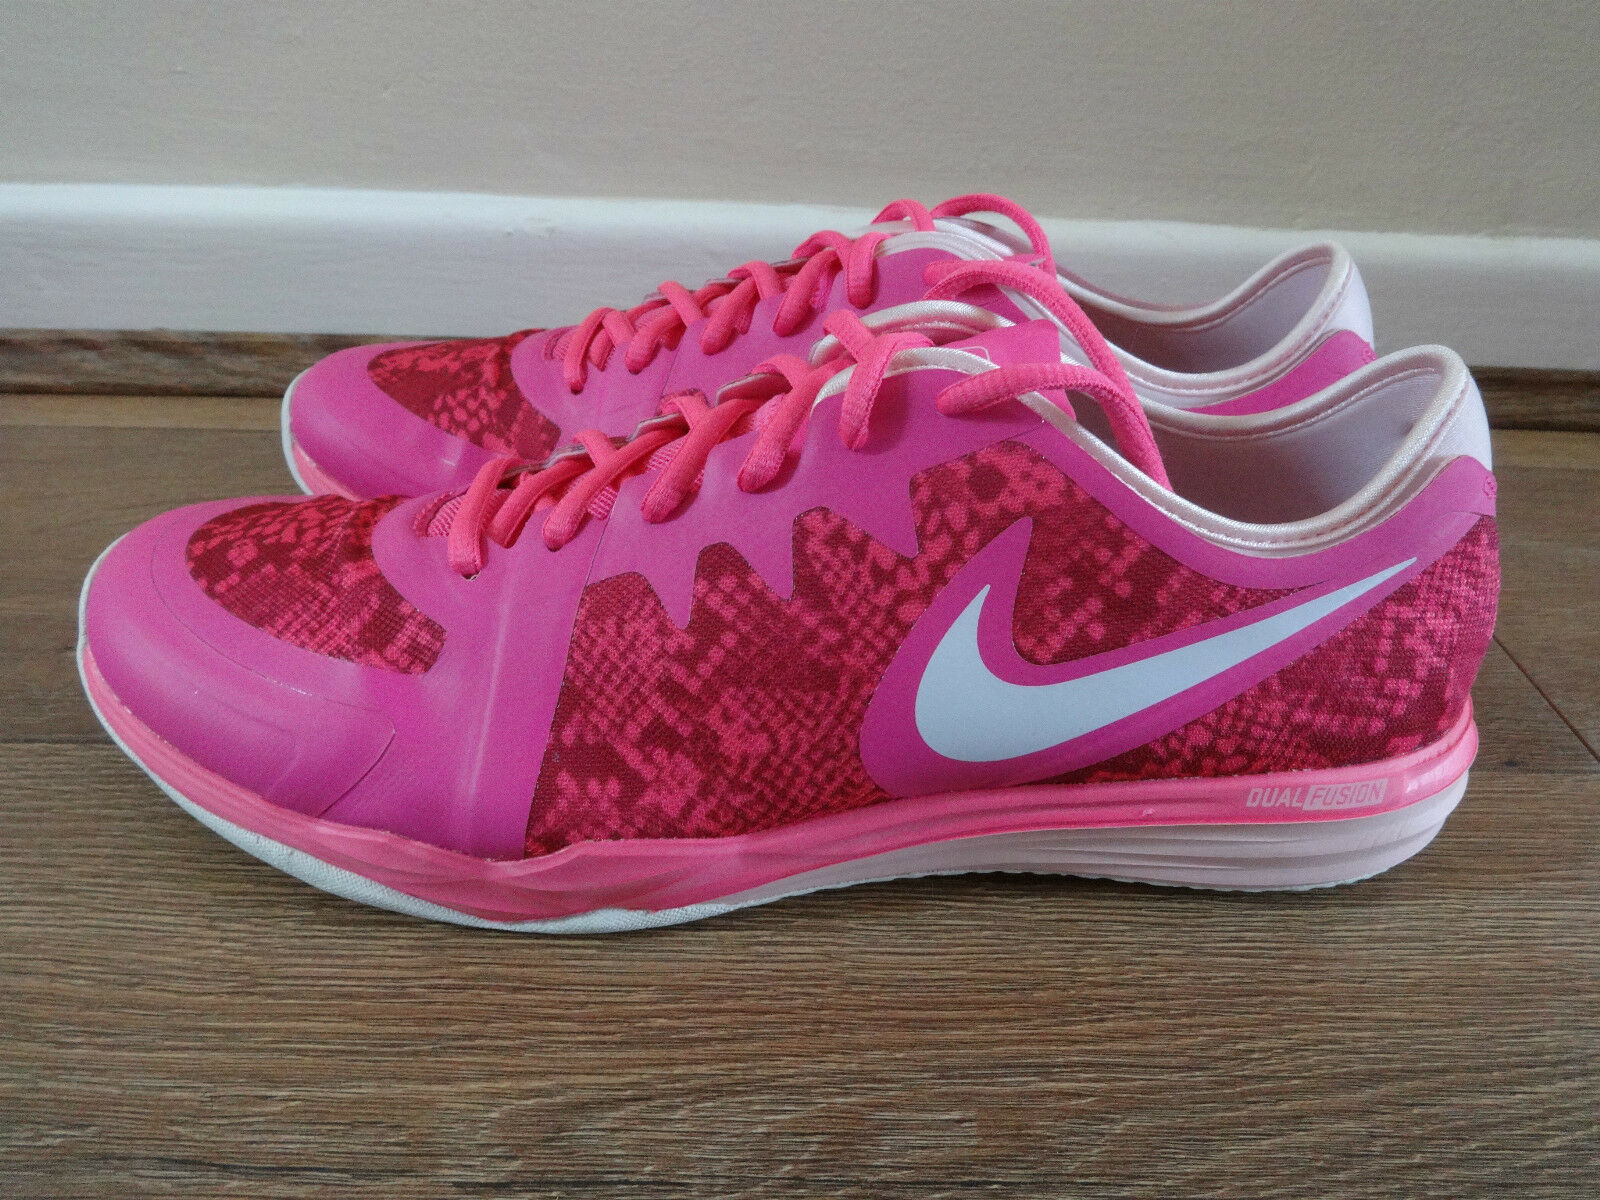 Nike Dual Fusion Fusion Fusion TR 3 Print   da ginnastica 704941 604 EU 42.5   10.5 Nuovo + Scatola 8a0dae